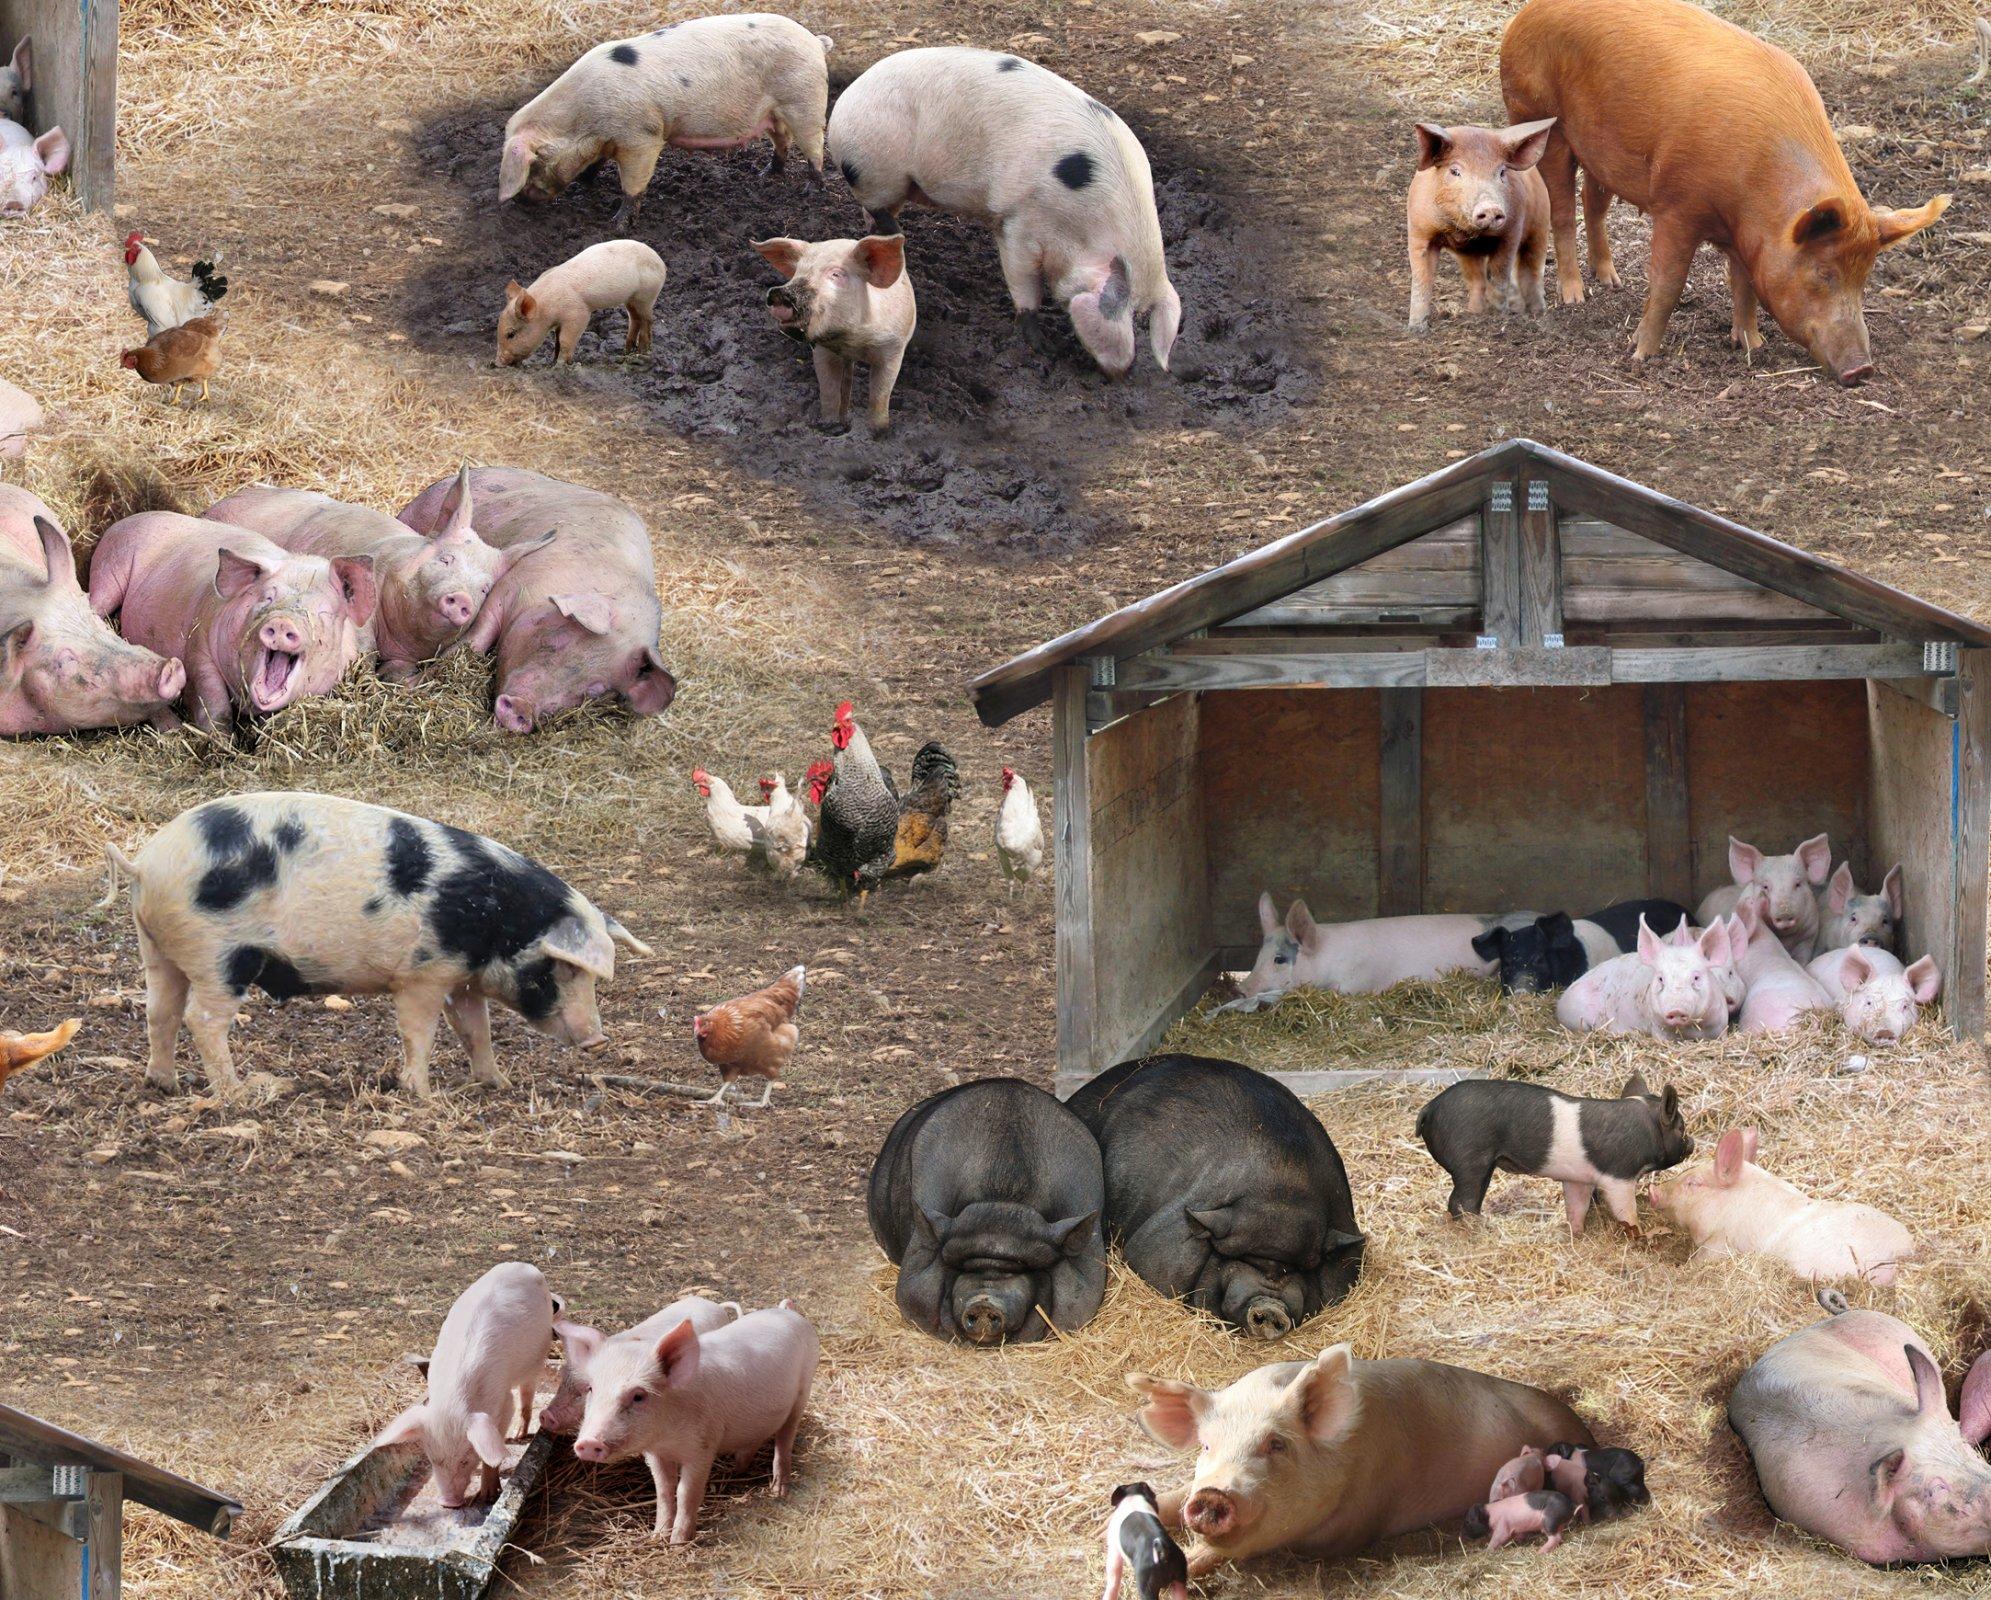 Farm Animals Scenic Brown Pigs